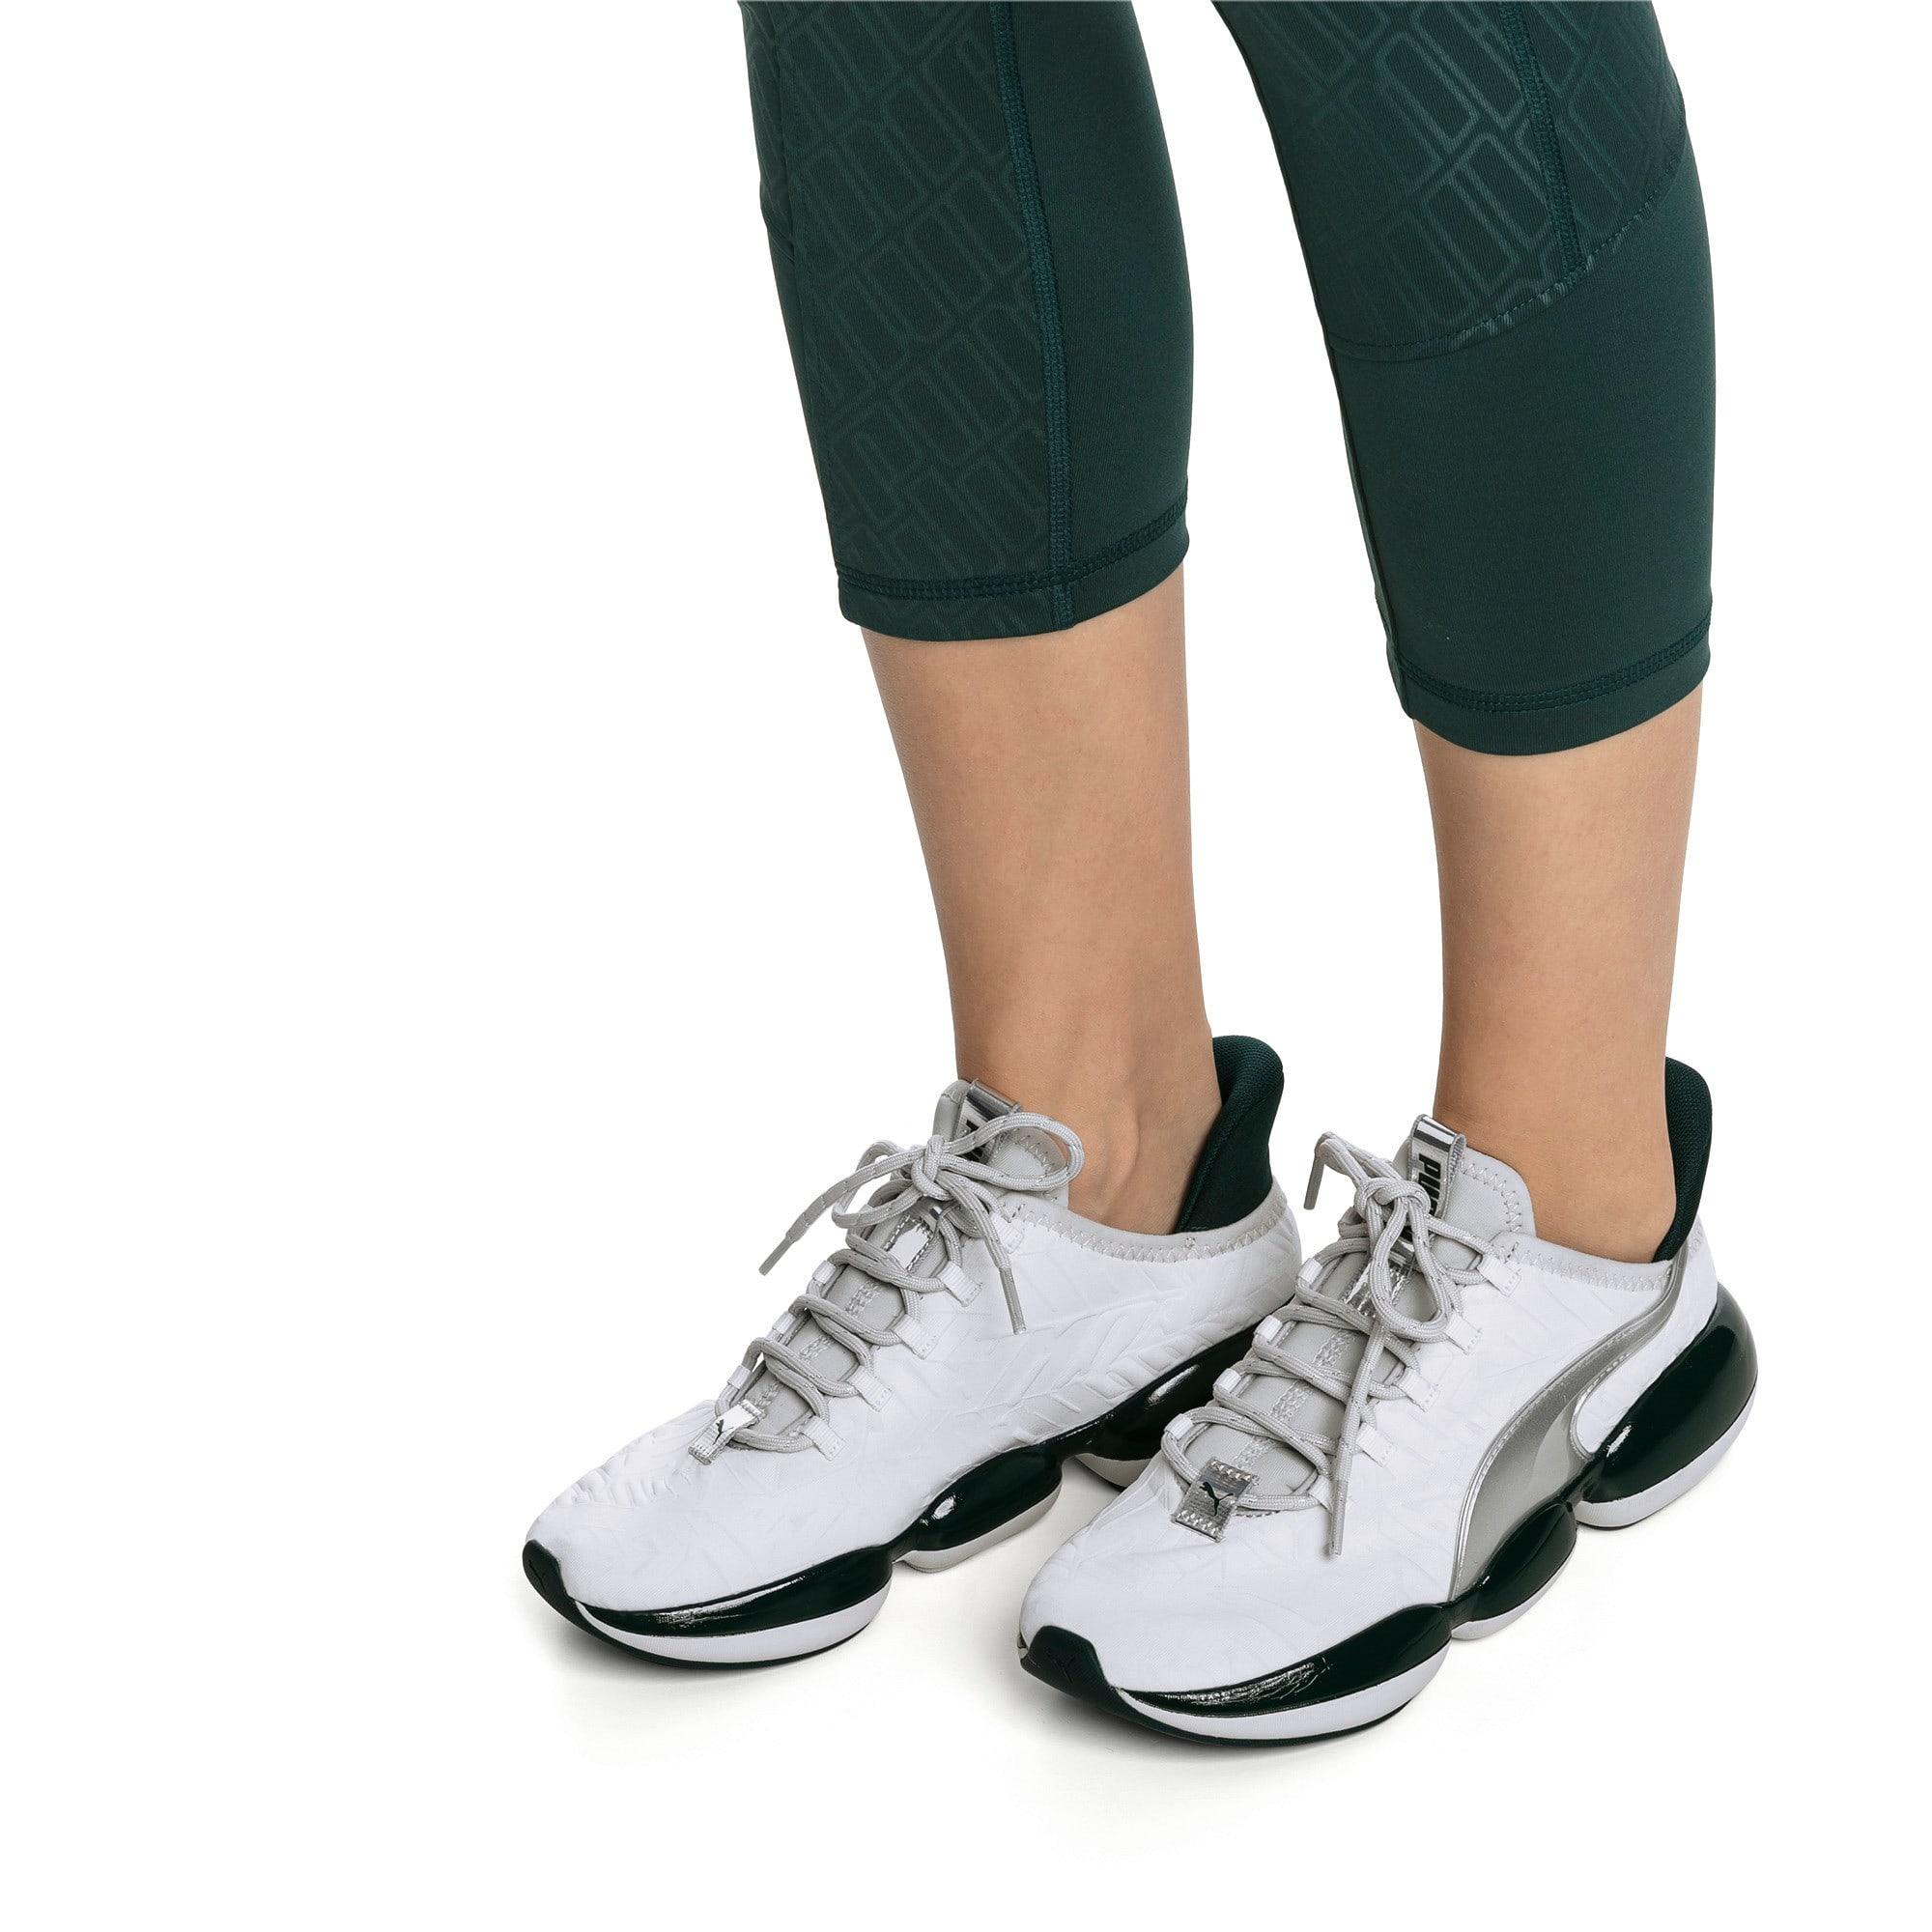 Miniatura 2 de Zapatos deentrenamiento Mode XT Trailblazer para mujer, Puma White-Ponderosa Pine, mediano